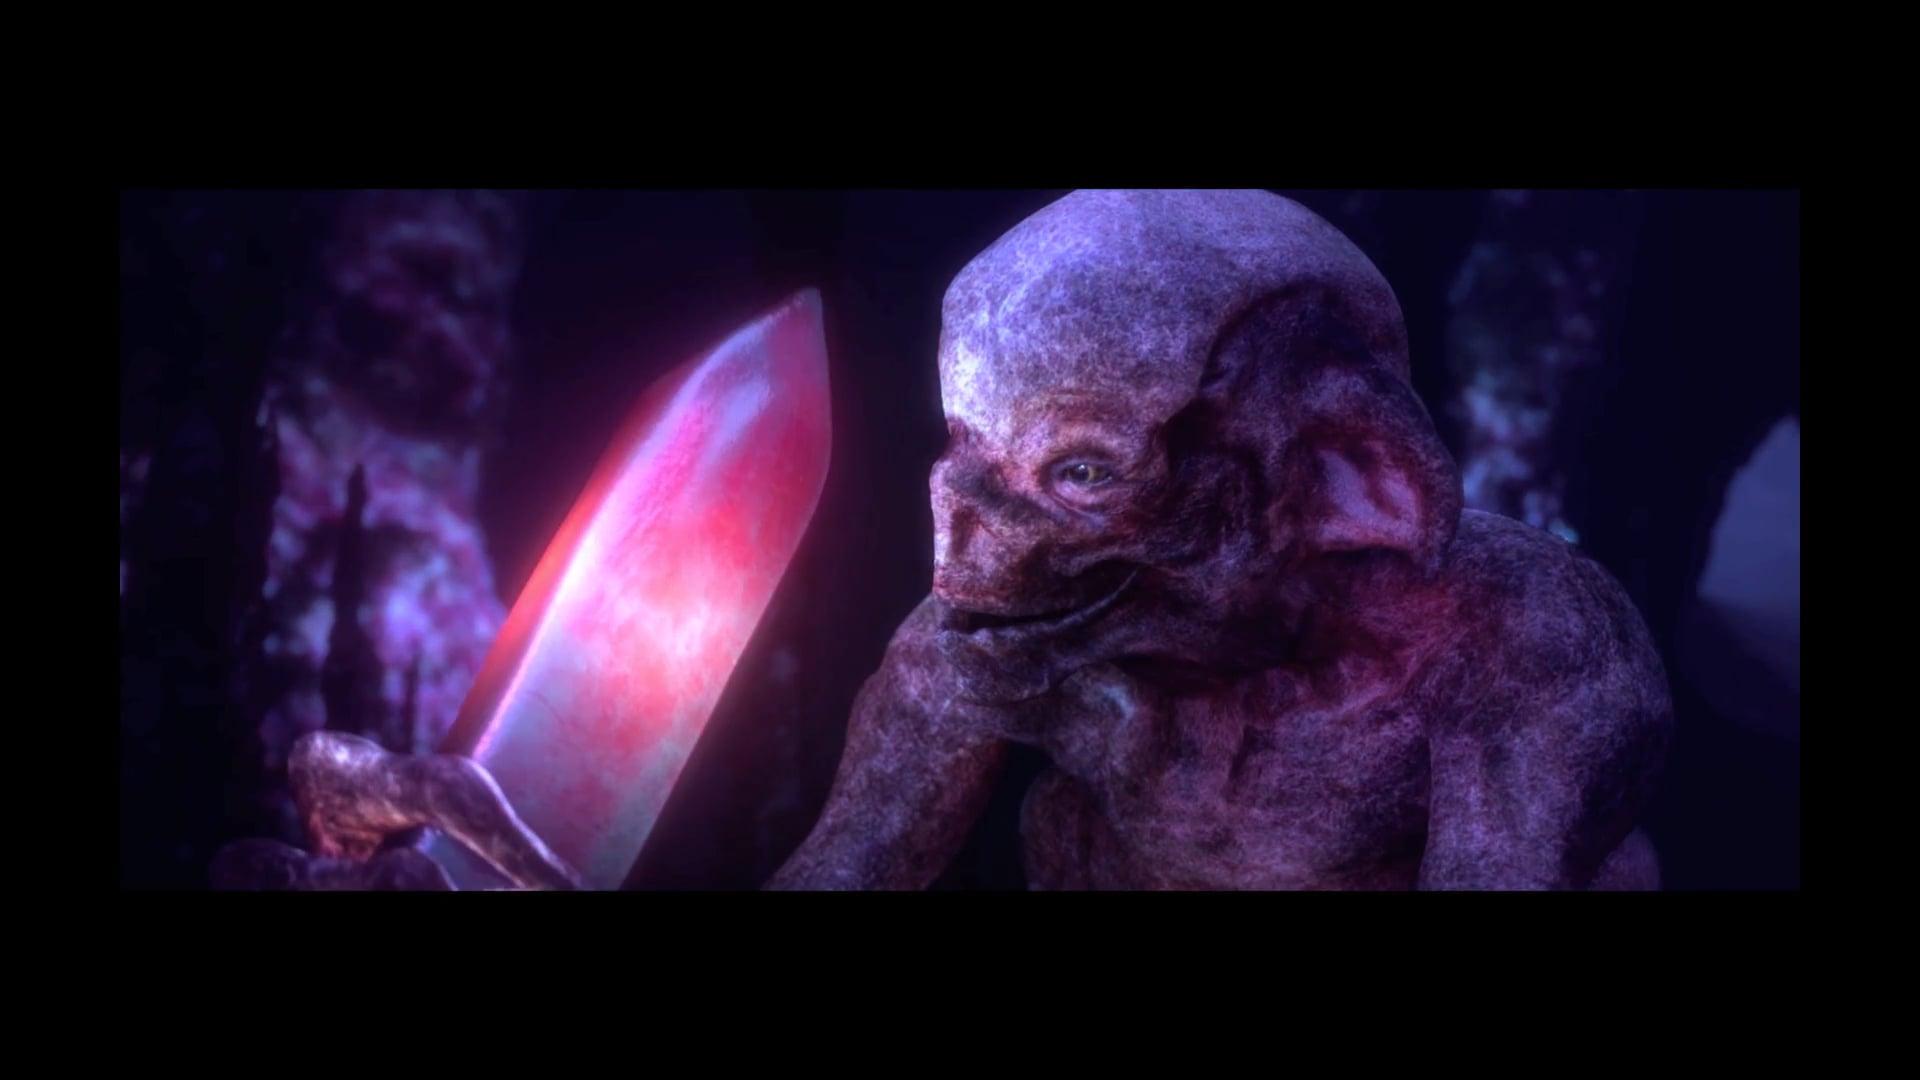 Chirality - CGI 3D Animated Short Sci-Fi Film (Music and Sound Design by Aija Alsina)